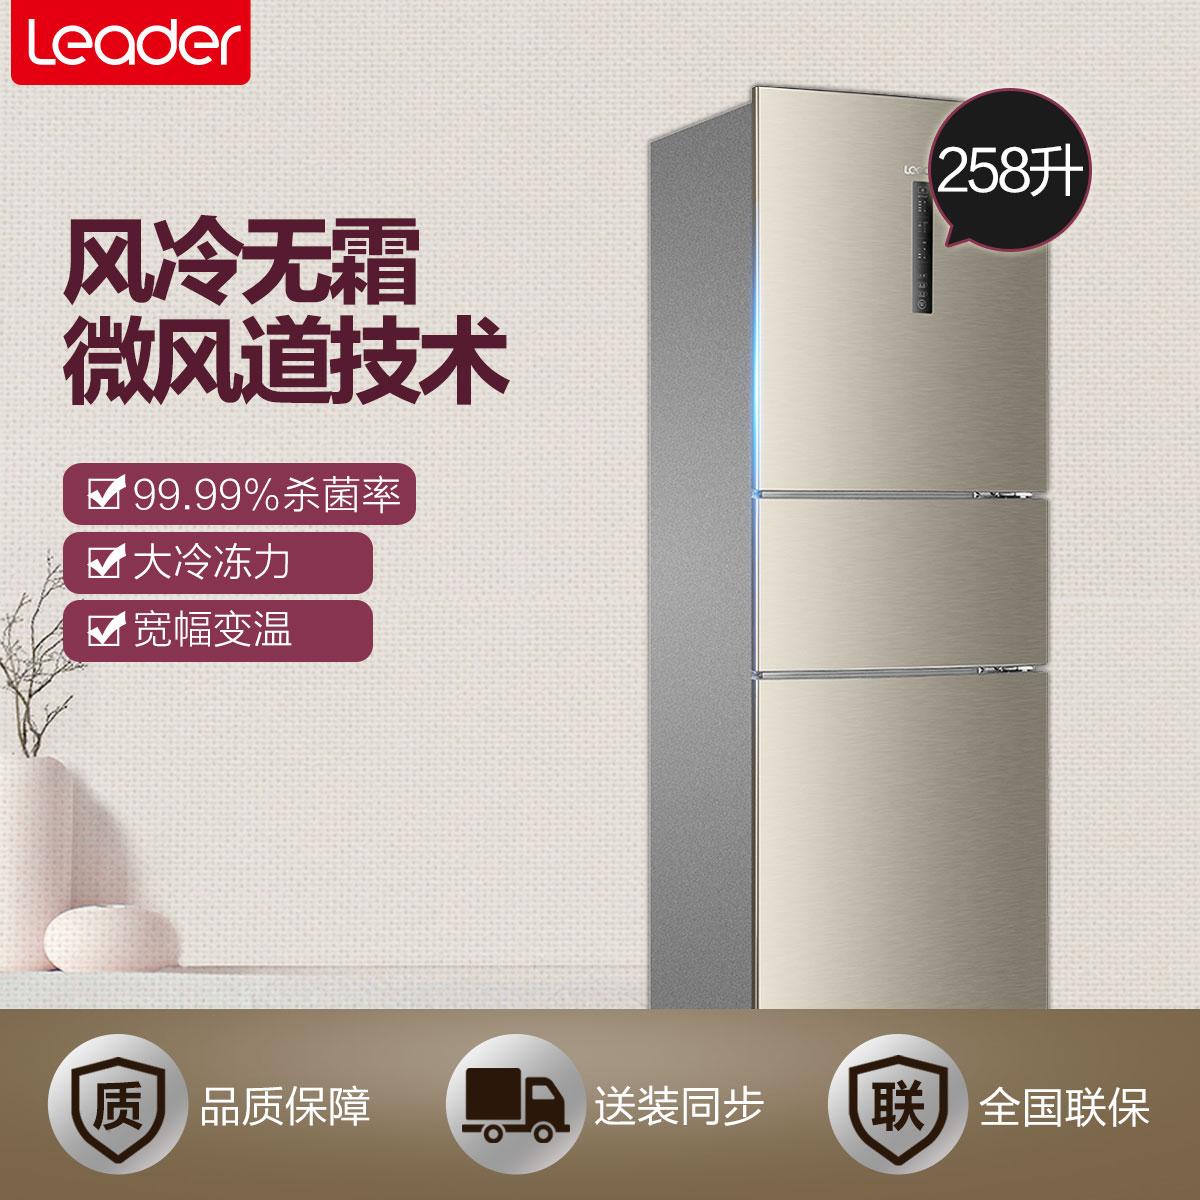 Leader/统帅 冰箱 BCD-258WLDPN 258升三门冷藏冷冻风冷无霜节能电冰箱